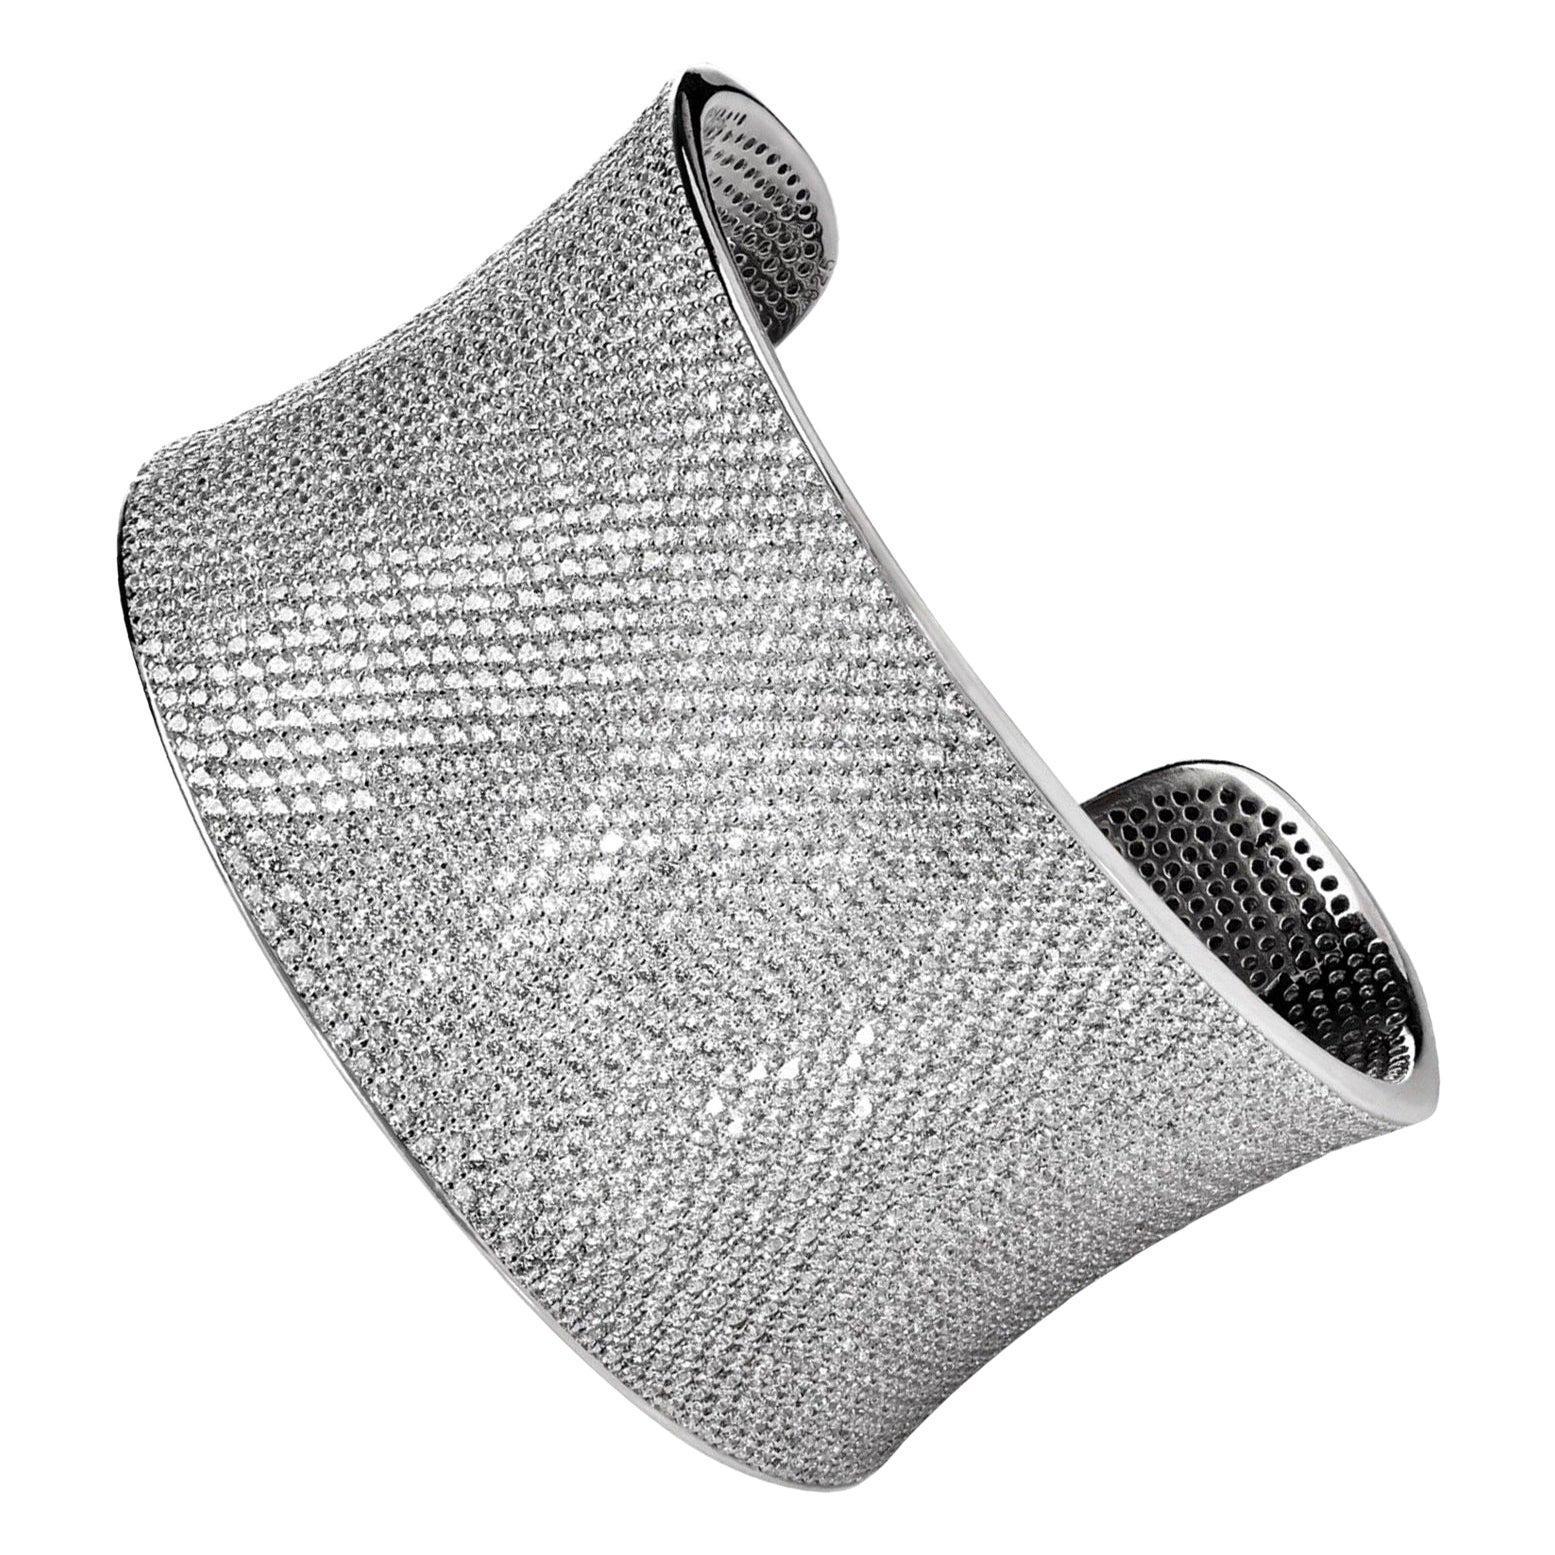 Diamond Bespoke 47 Carat Bangle 18 Karat White Gold Wide Cuff Dazzling Bracelet